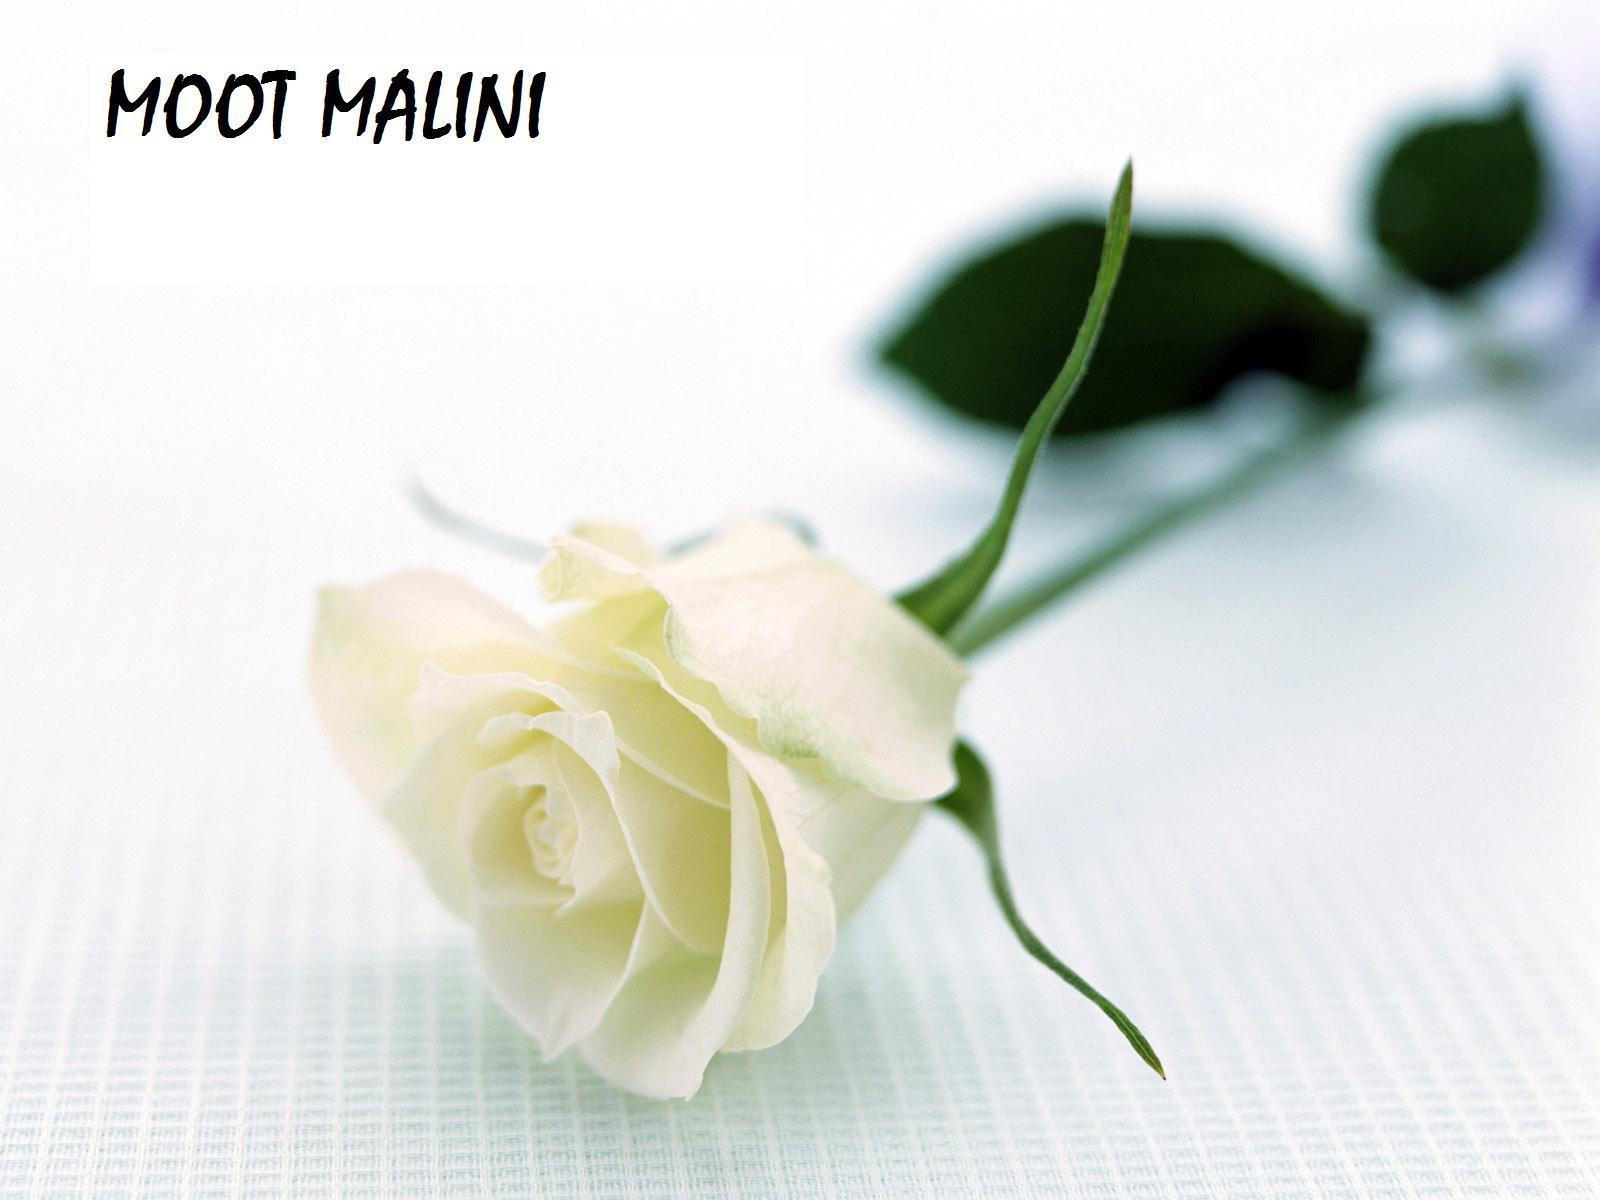 MOOT MALINI